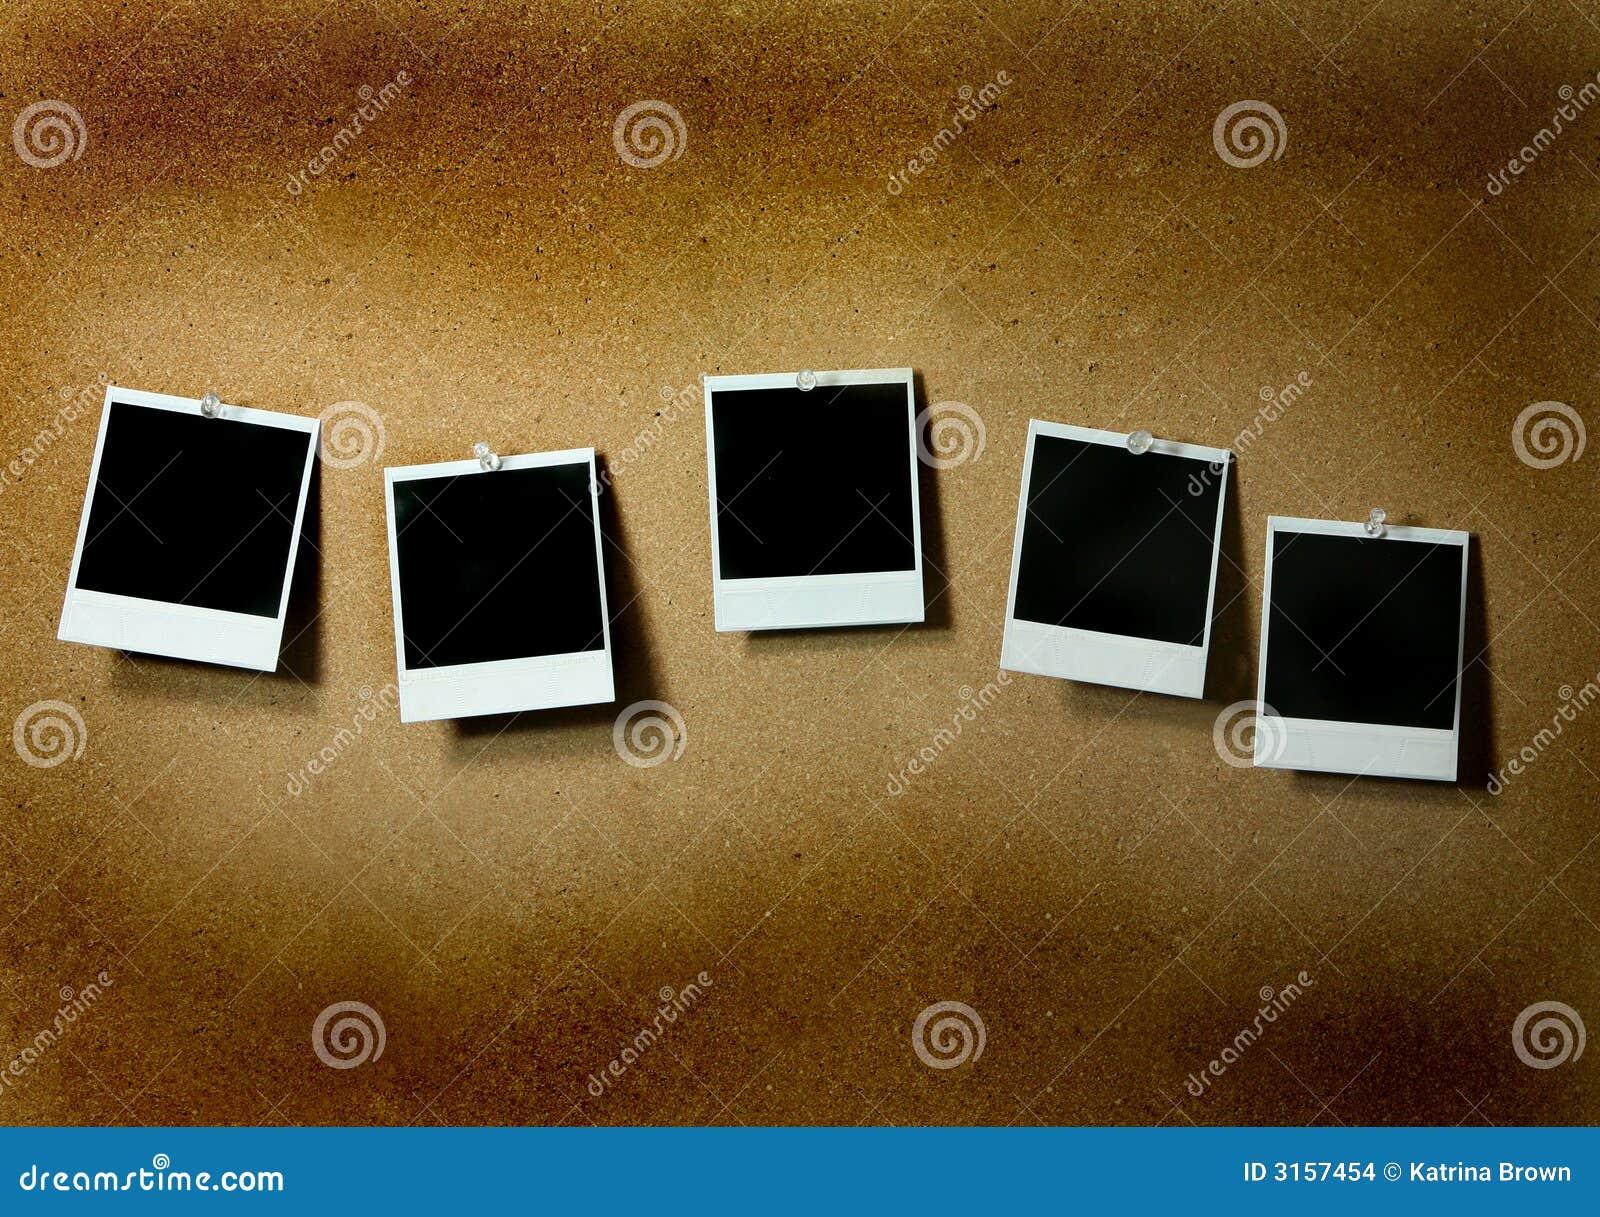 Blank Grunge Polaroids Pinned